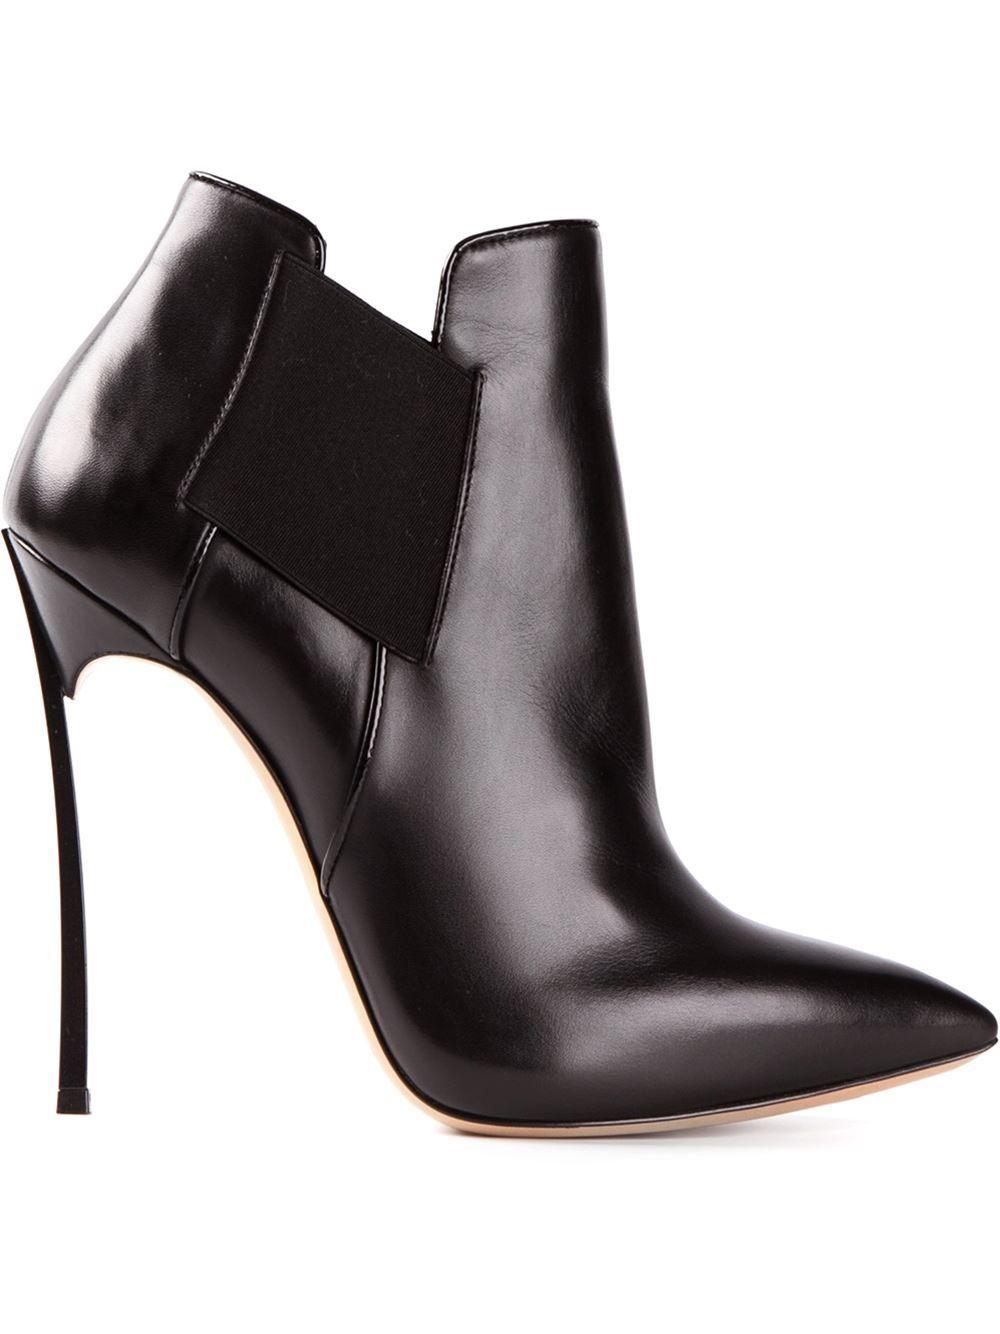 3e5eeadd2d875e Casadei Thinned Heel Ankle Boots - Biondini Paris - Farfetch.com ...